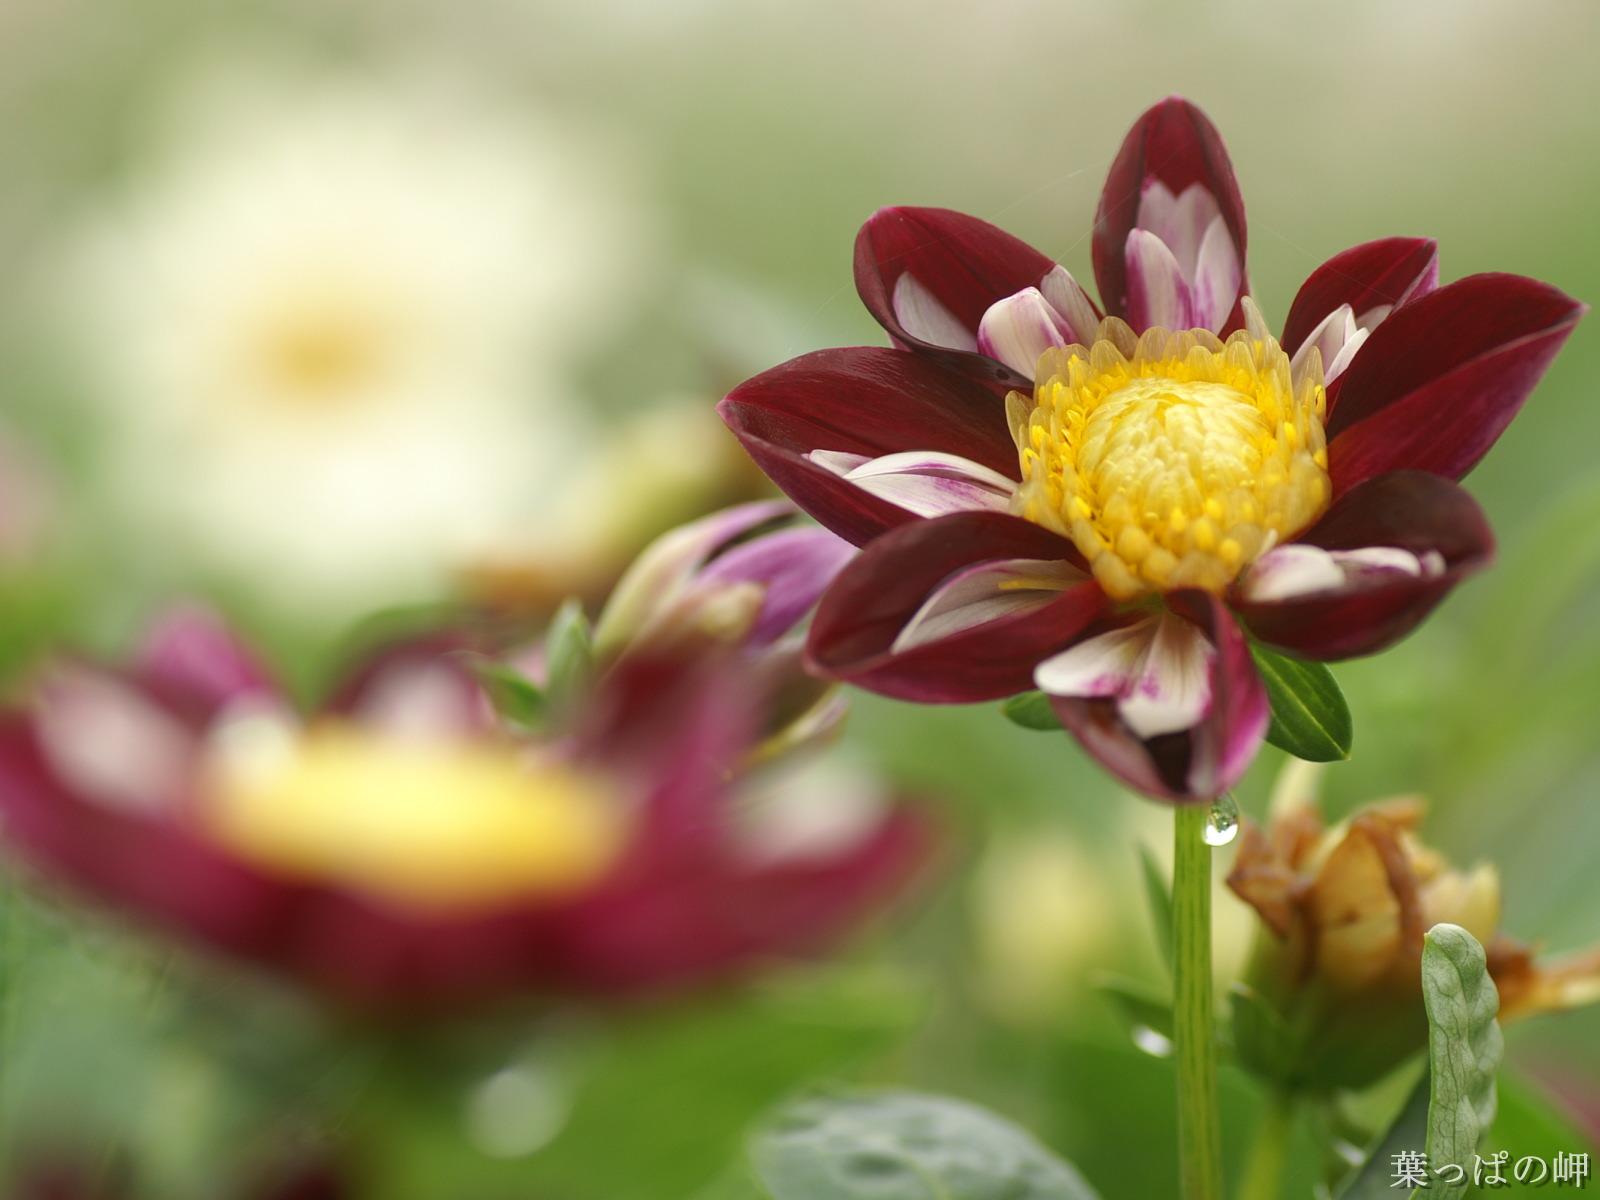 http://3.bp.blogspot.com/-HBjBkpdtUIU/Ti5ytGaiaoI/AAAAAAAAAXk/Rt-Q2BDH1jM/s1600/beautiful%2Bflowers%2Bhi%2Bres%2B%252815%2529.jpg